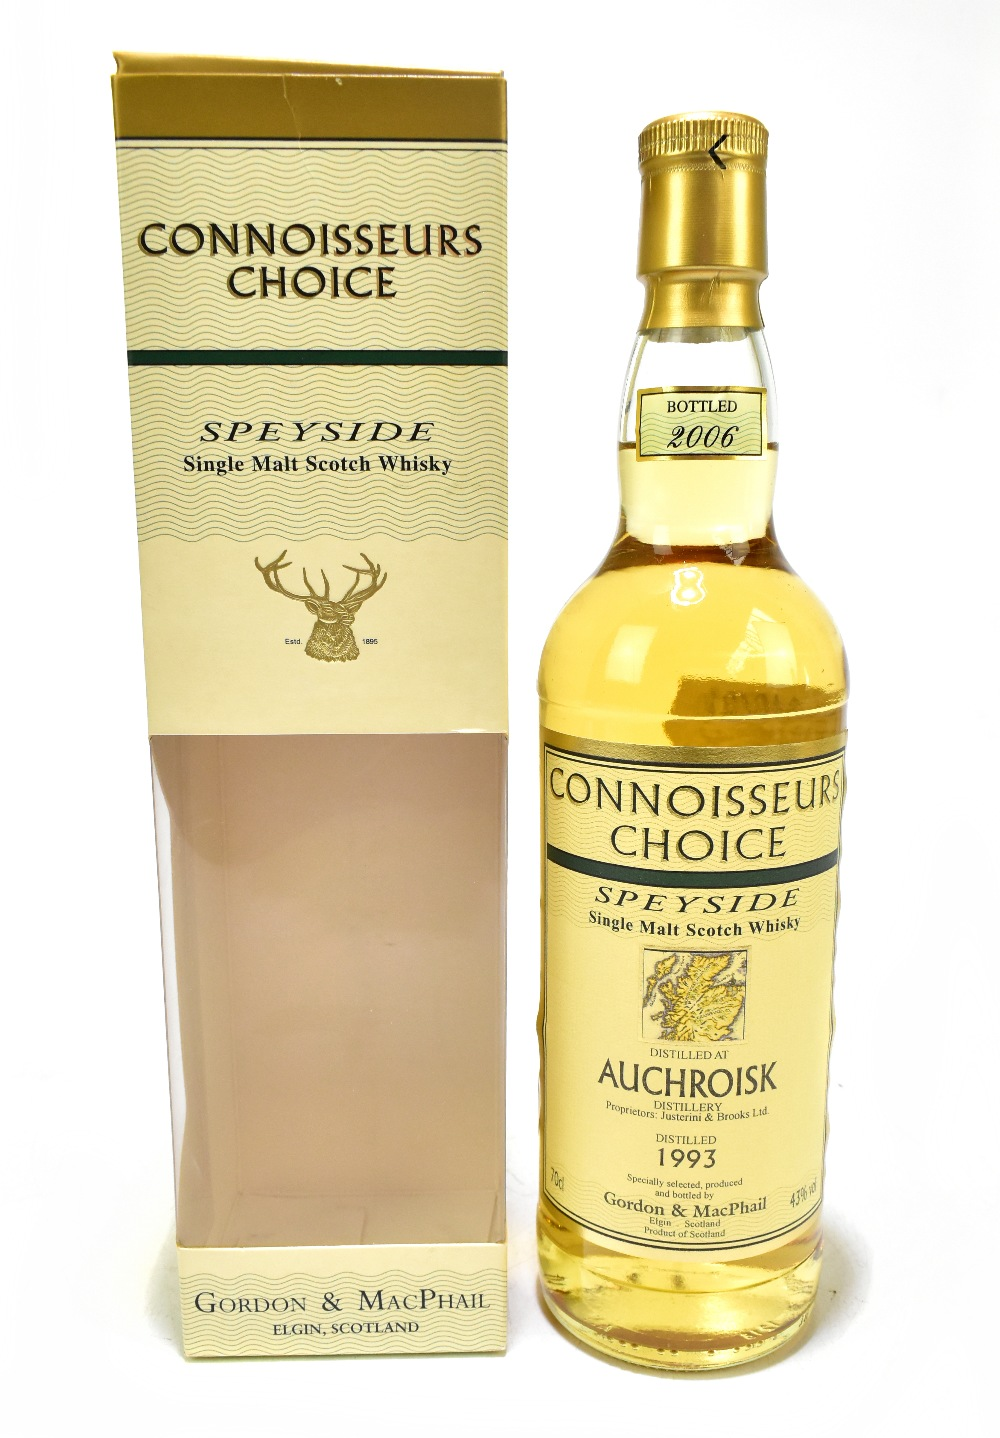 WHISKY; a single bottle of Auchroisk Speyside single malt Scotch whisky, distilled 1993 and